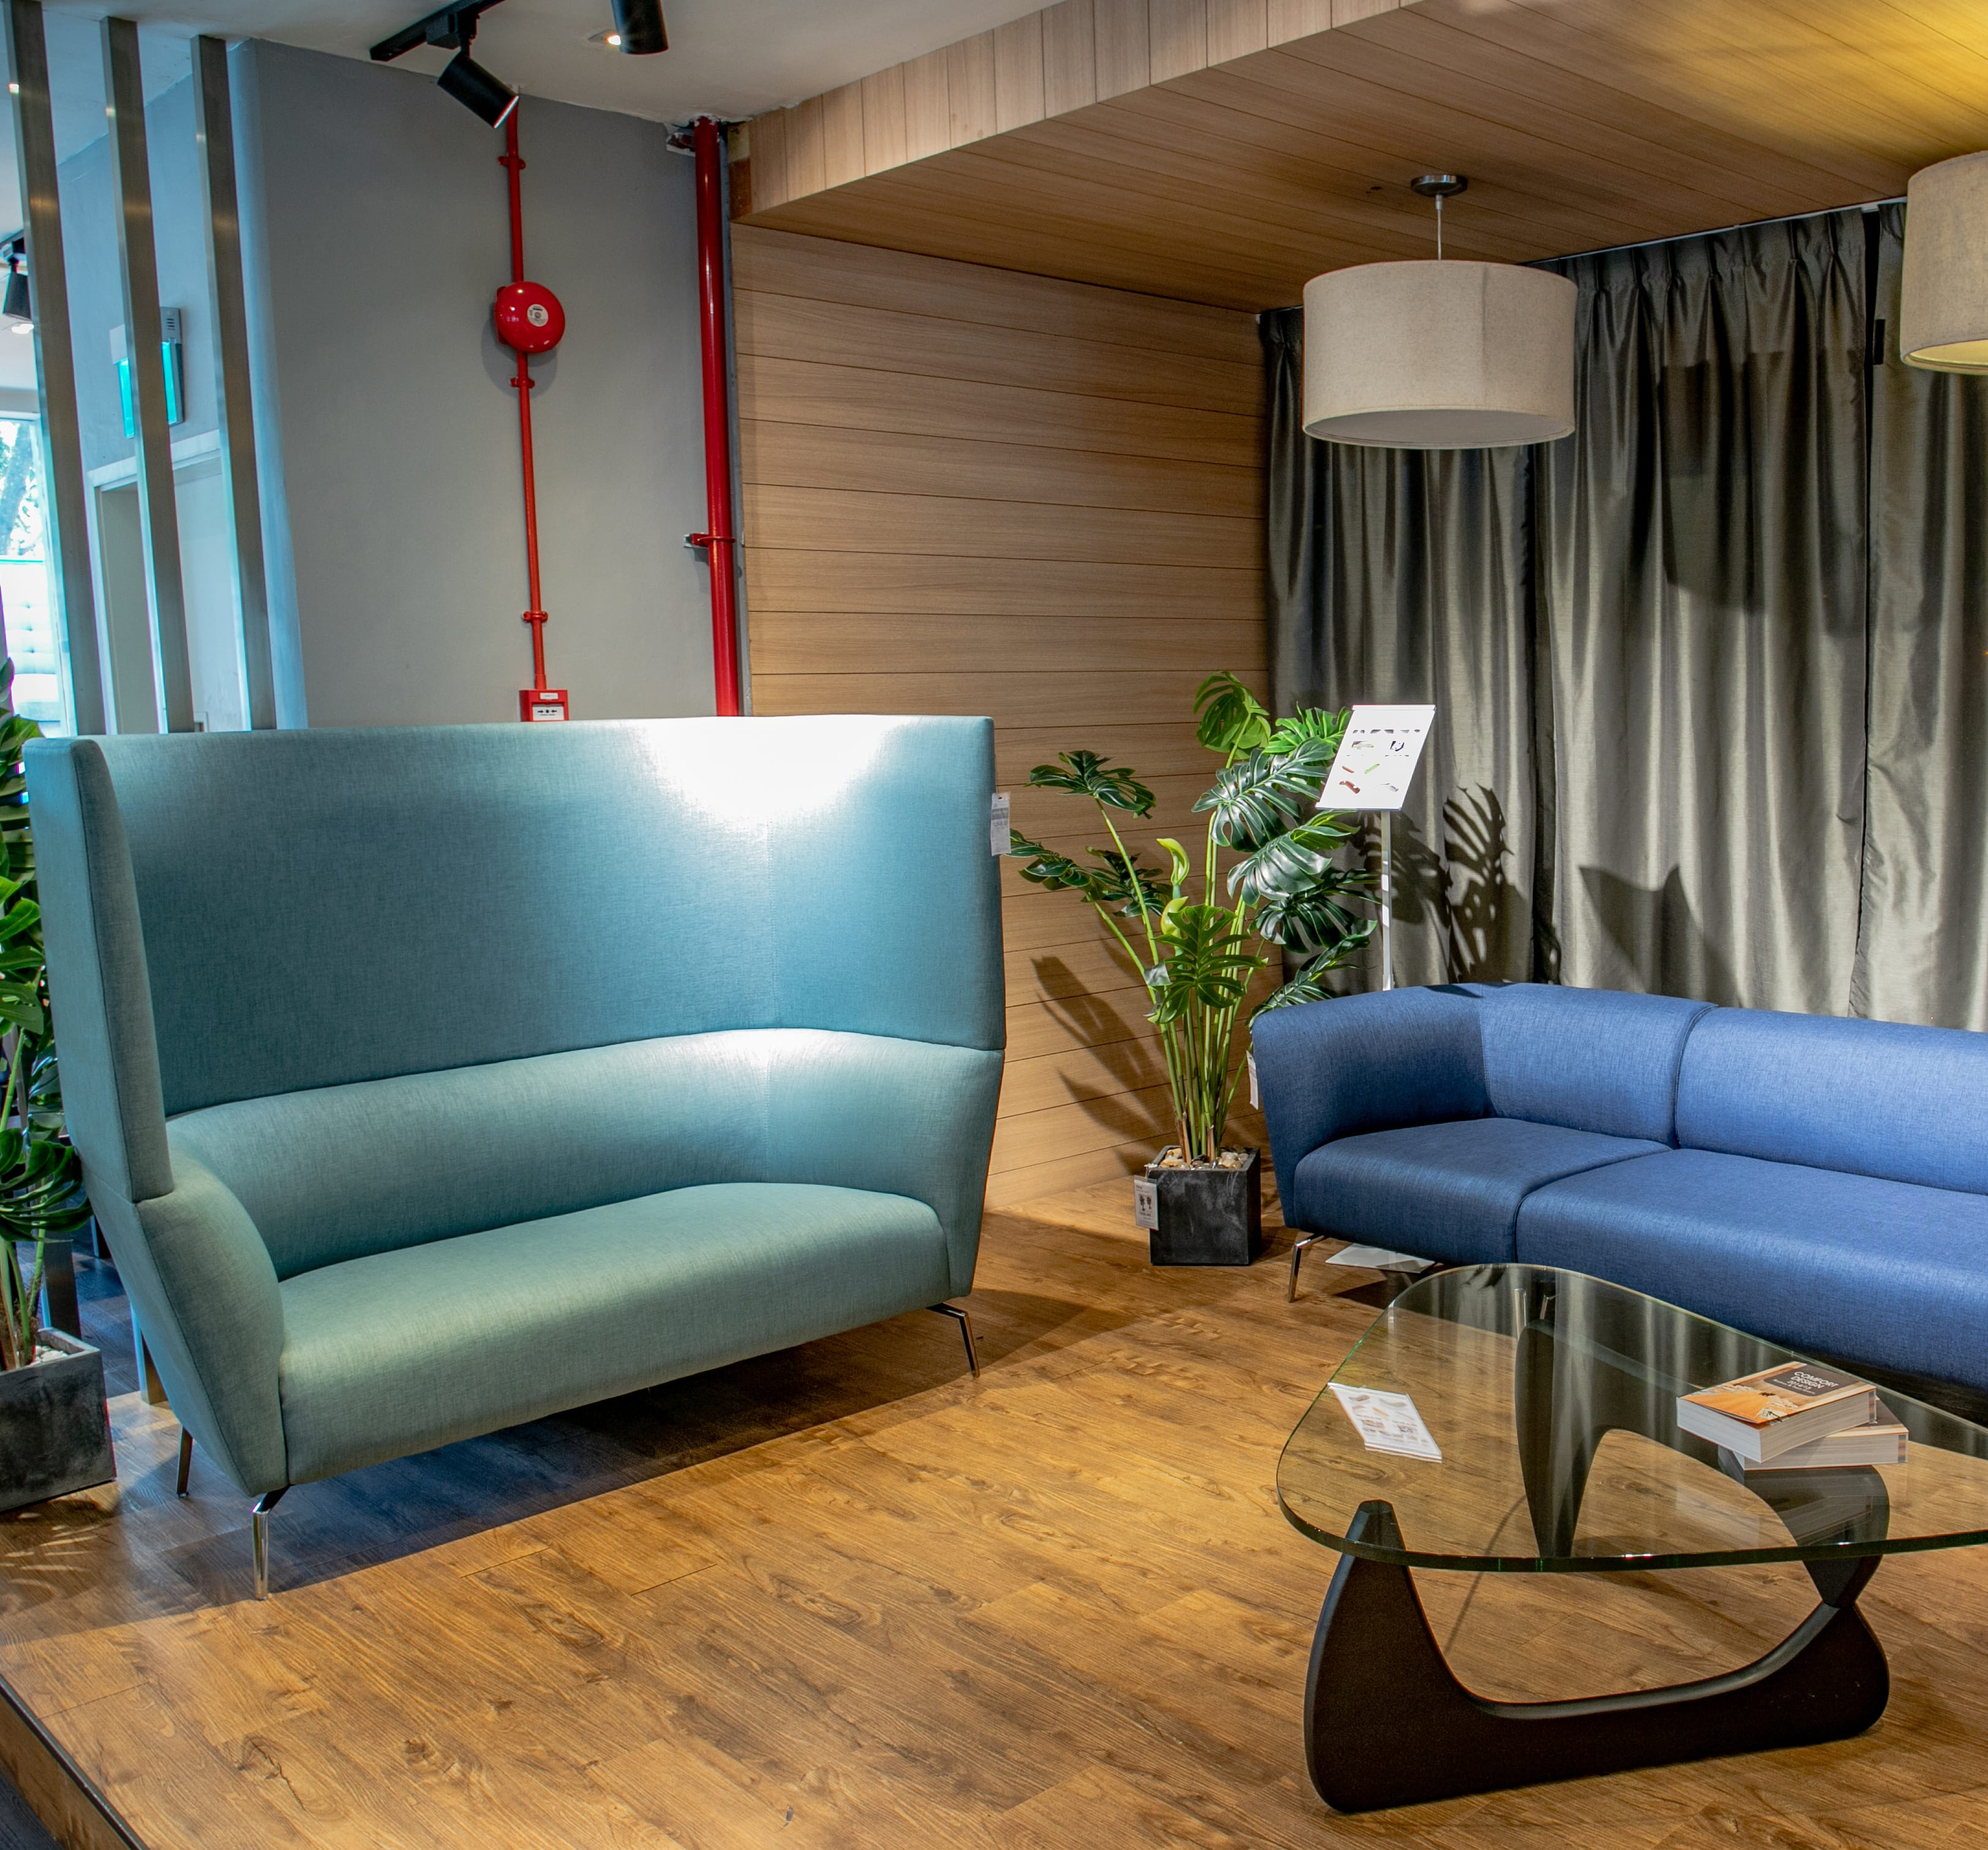 Oat Midback Modular Sofa Comfort Design The Chair